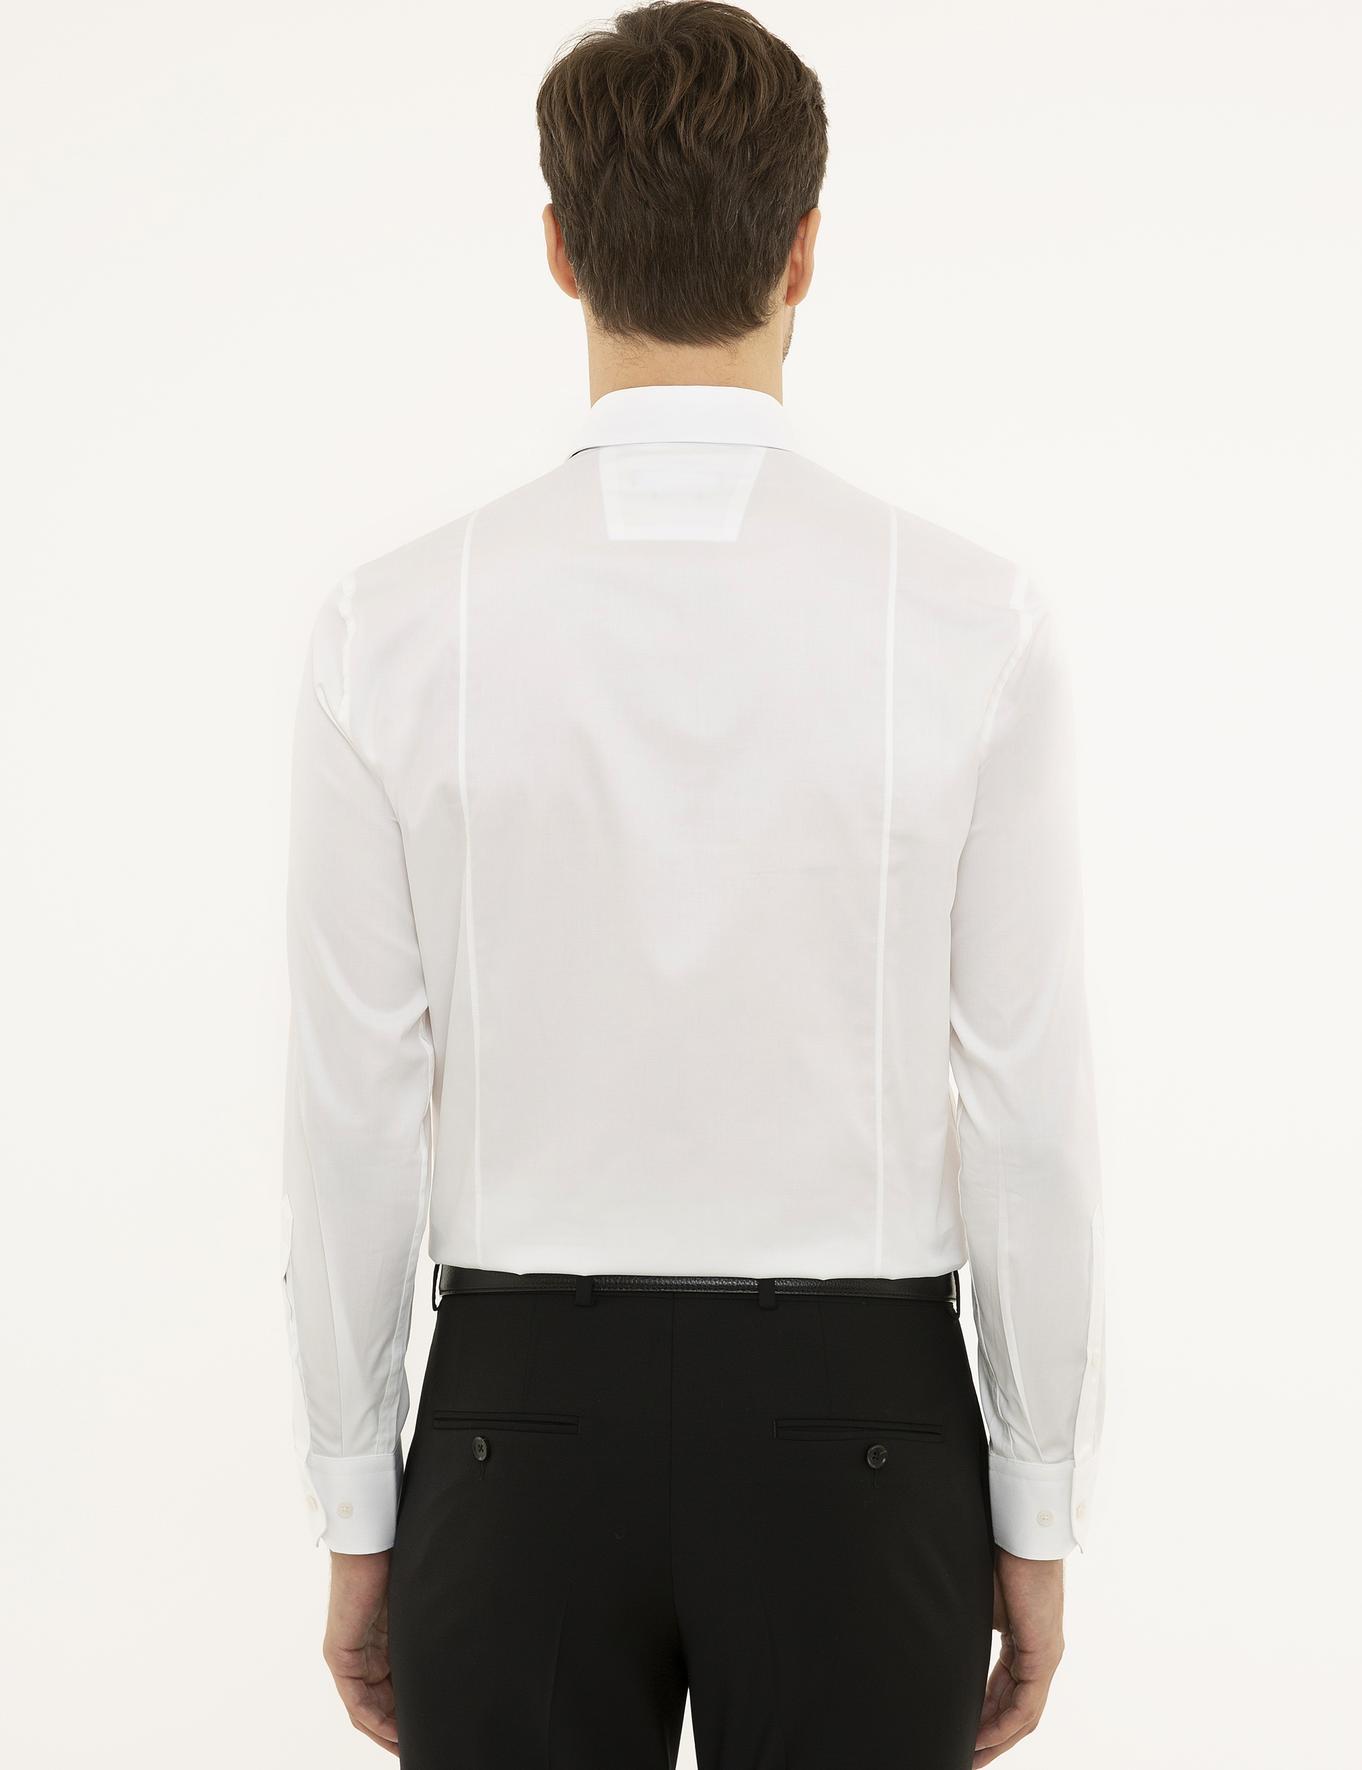 Beyaz Slim Fit Gömlek - 50230473007